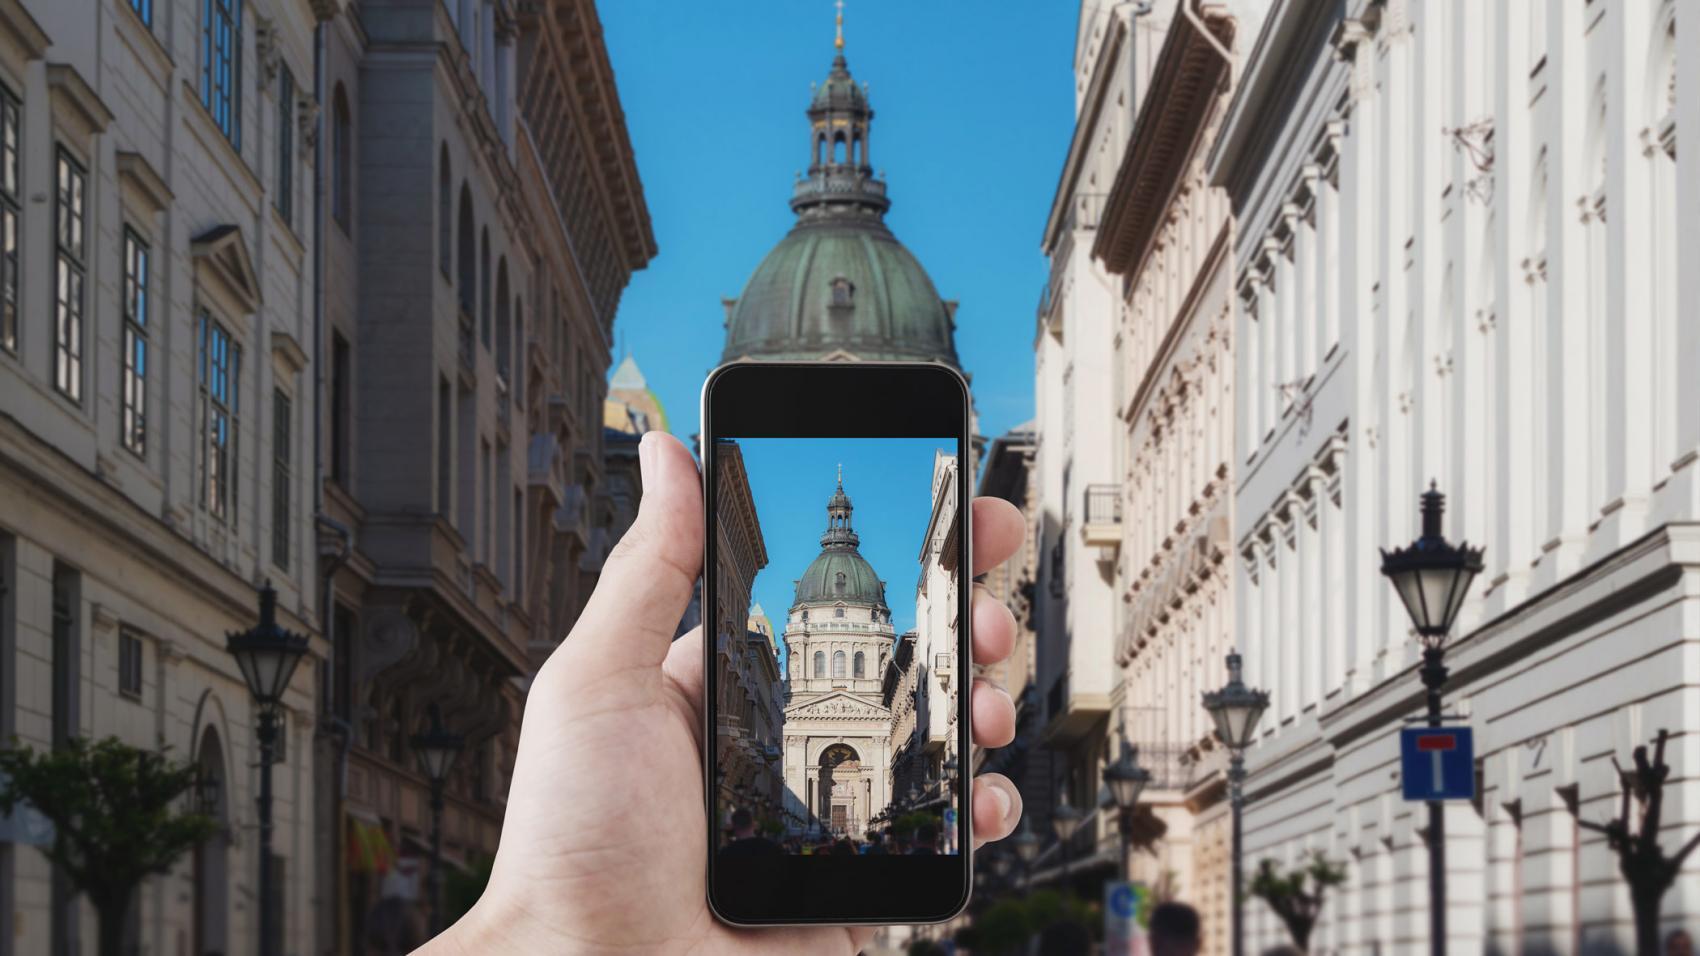 Digital tools to revitalize tourism